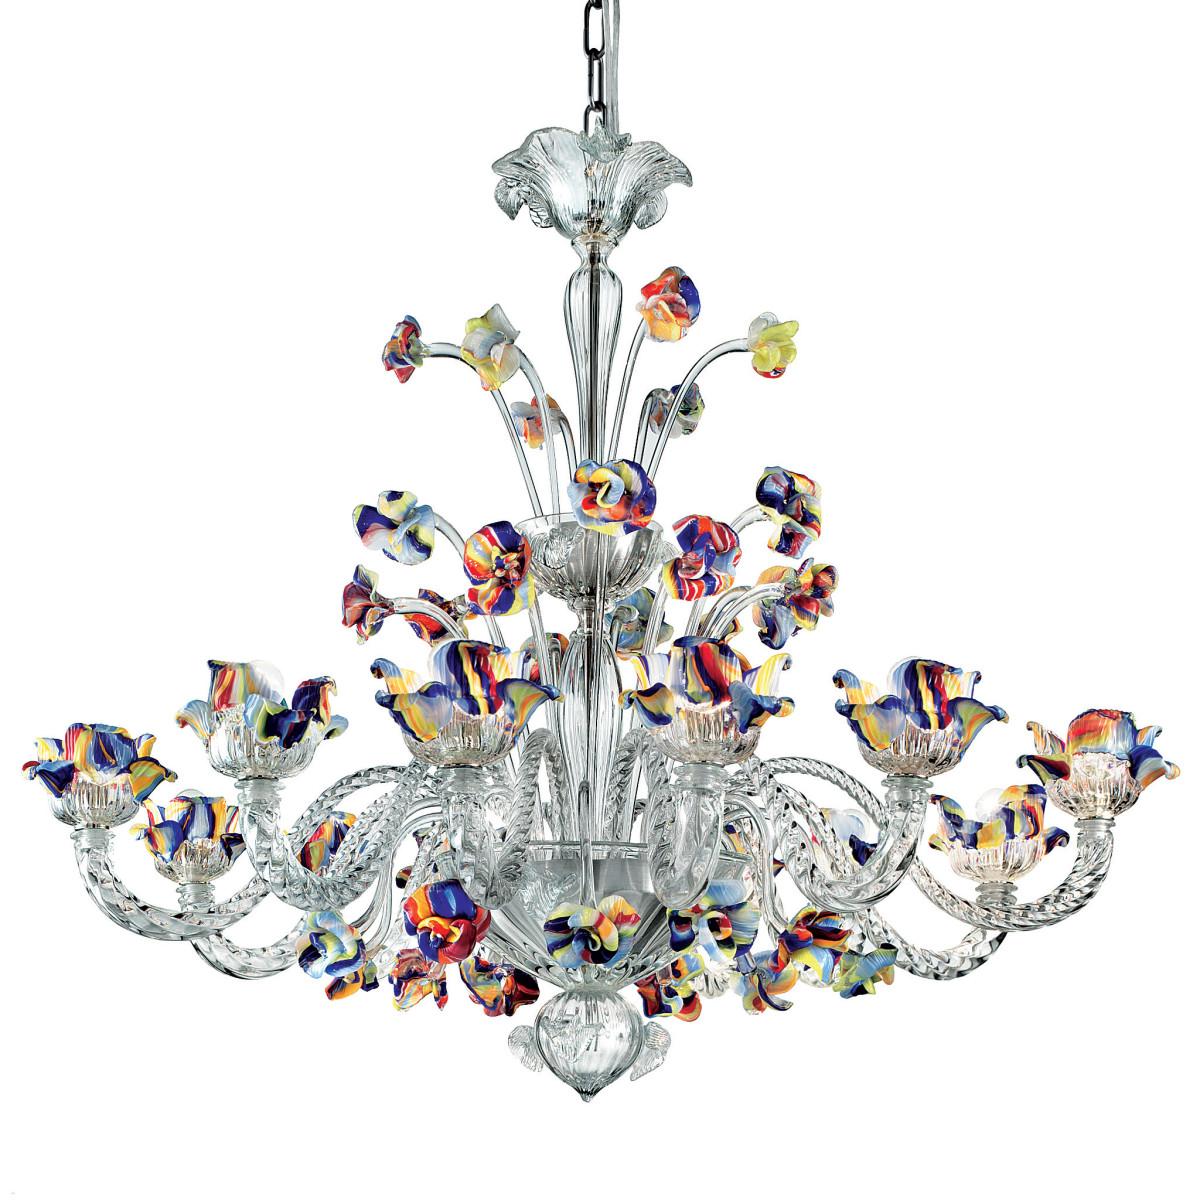 Cristallo 12 lights Murano chandelier - transparent polychrome color